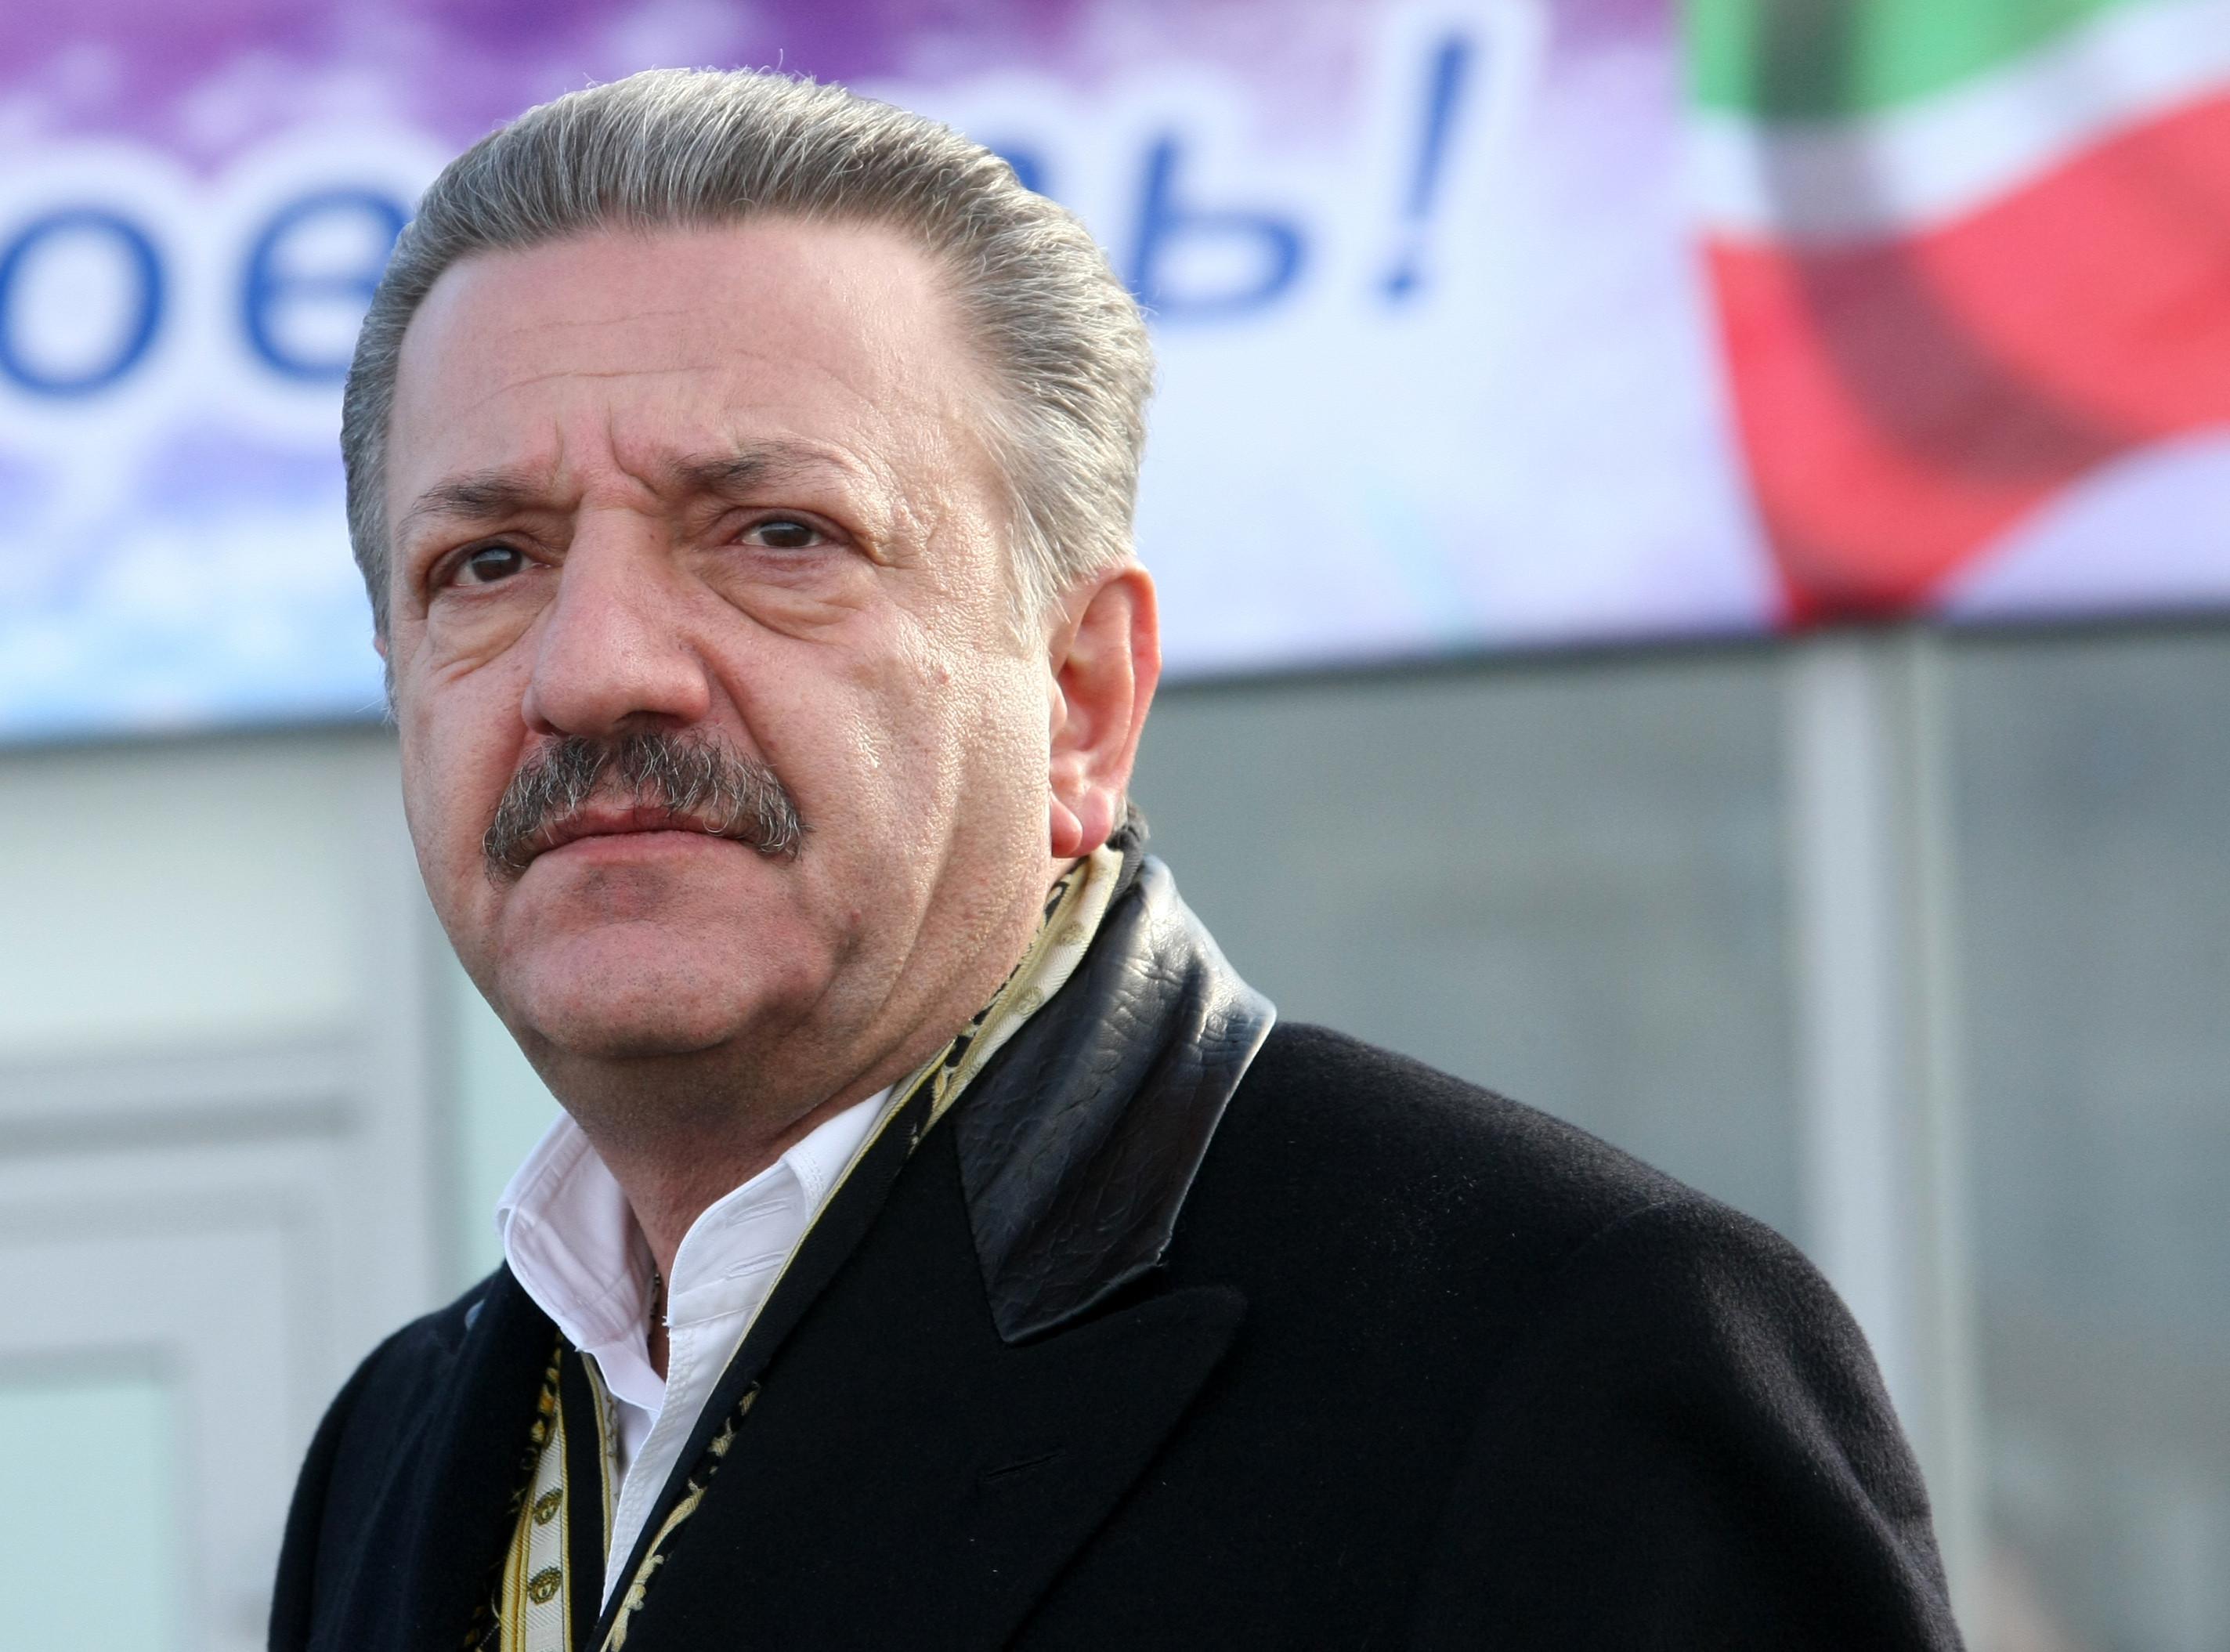 <p>Тельман Исмаилов. Фото: &copy;РИА Новости/Саид Царнаев</p>